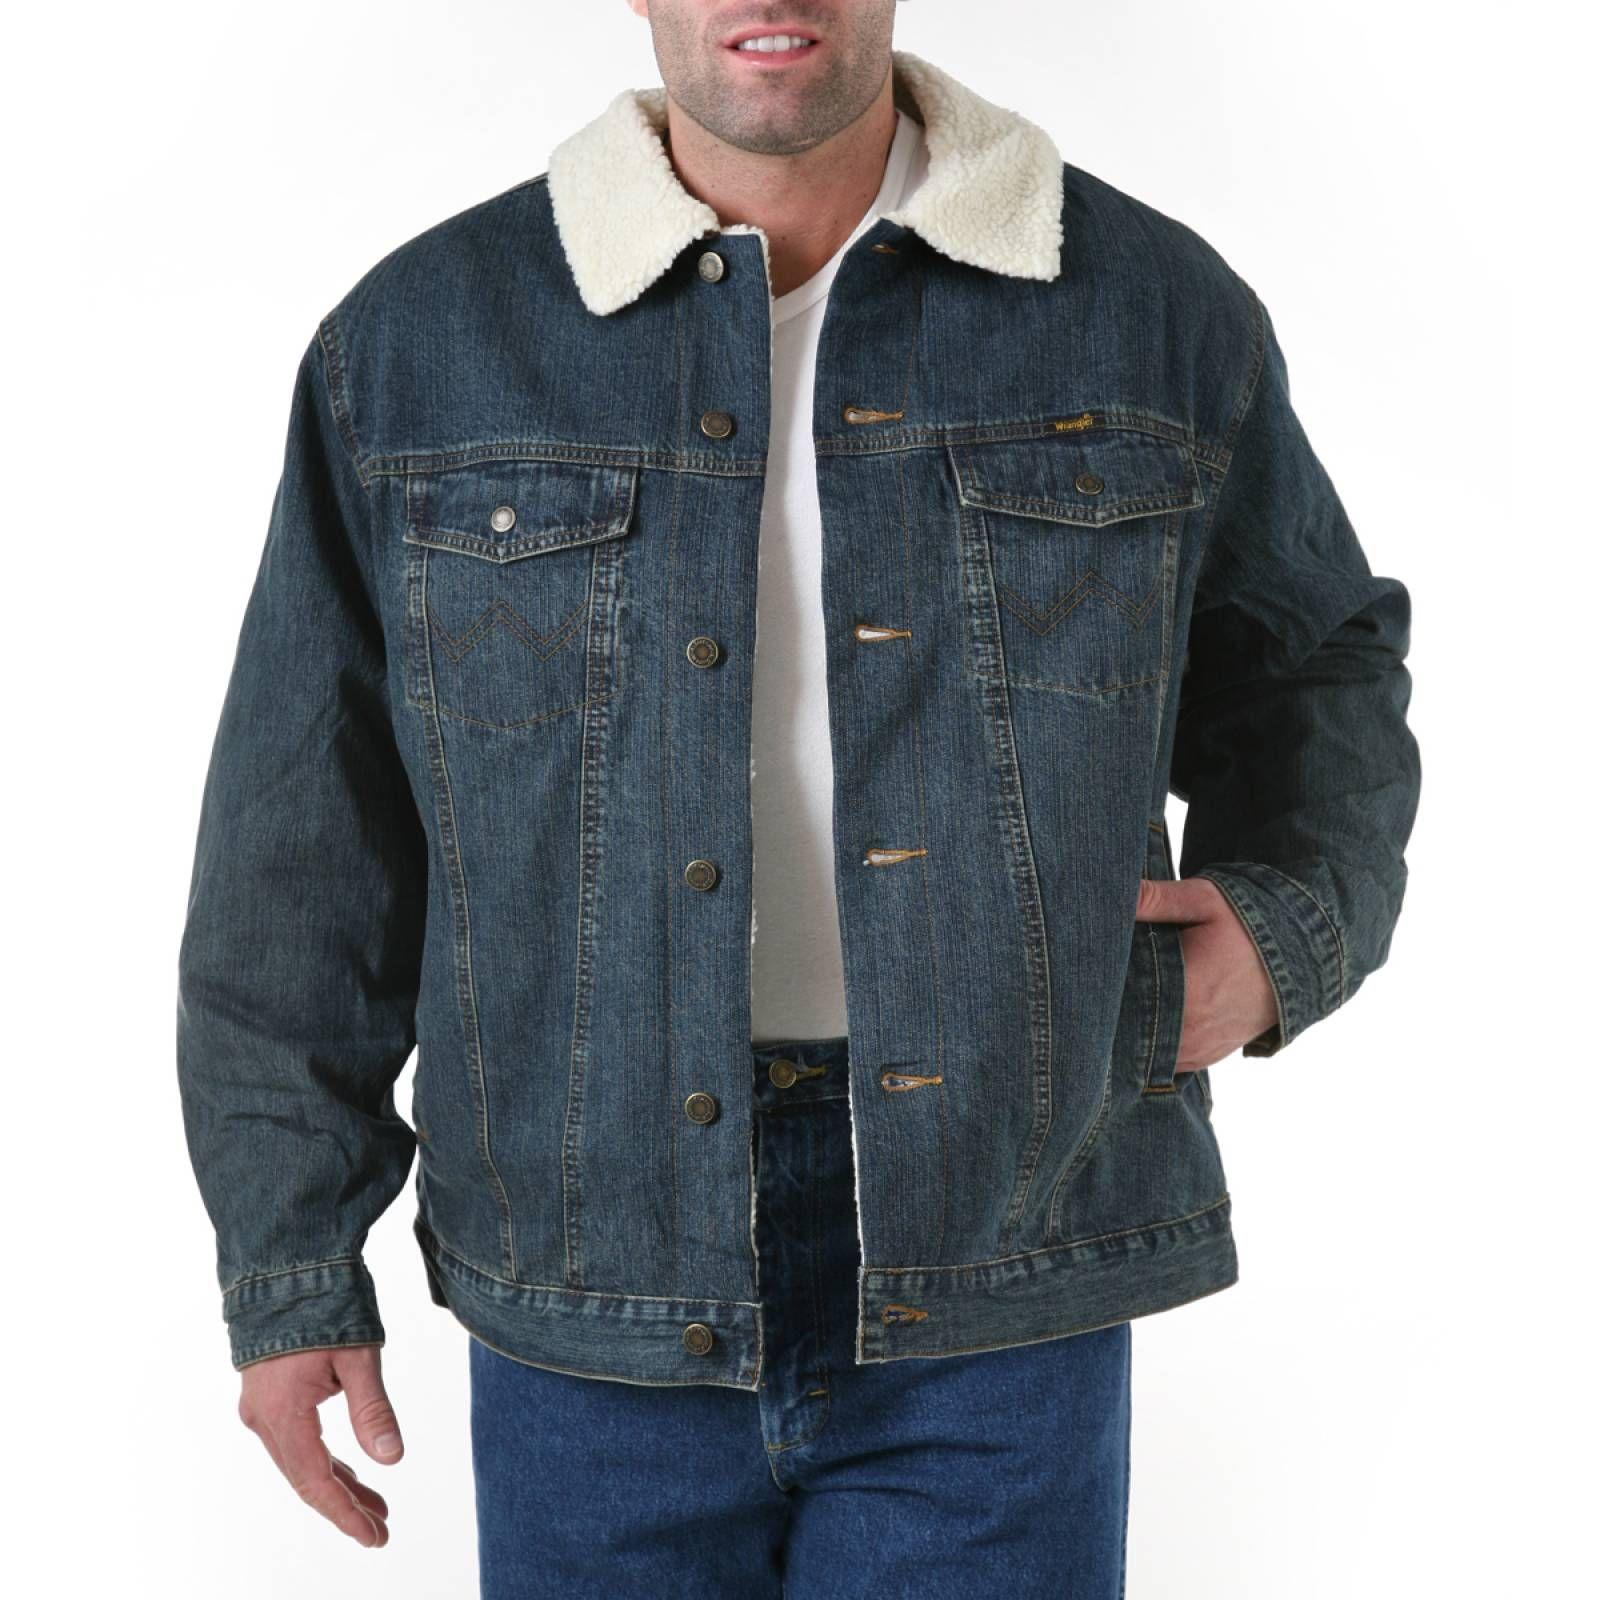 Wrangler Western Styled Sherpa Lined Denim Jacket Rustic Sherpa Lined Denim Jacket Denim Jacket Denim Jacket Men [ 1600 x 1600 Pixel ]